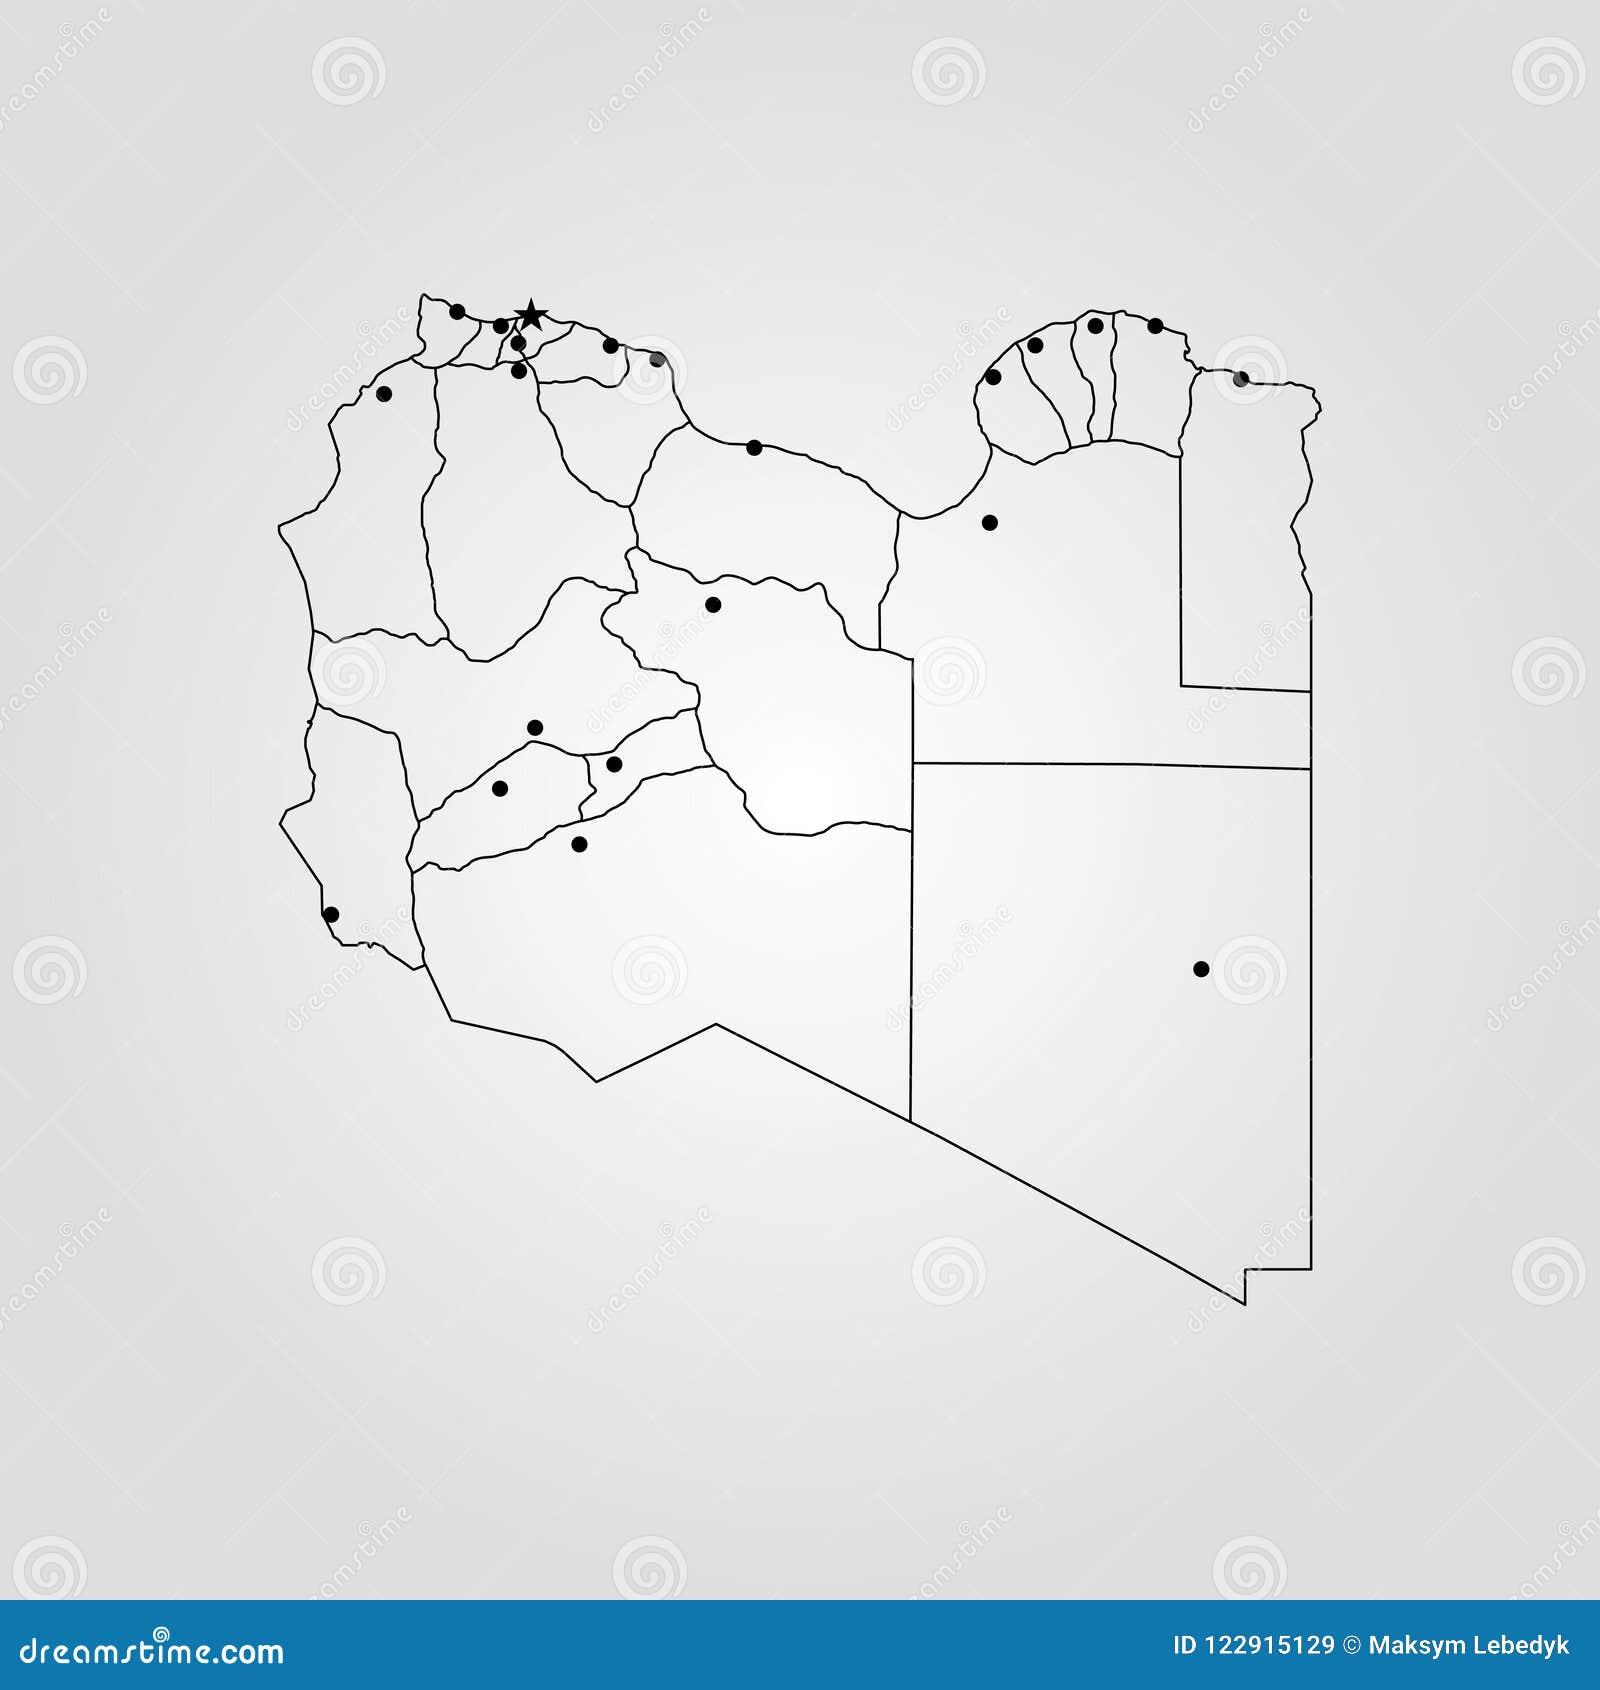 Libya On A World Map.Map Of Libya Stock Illustration Illustration Of Abstract 122915129